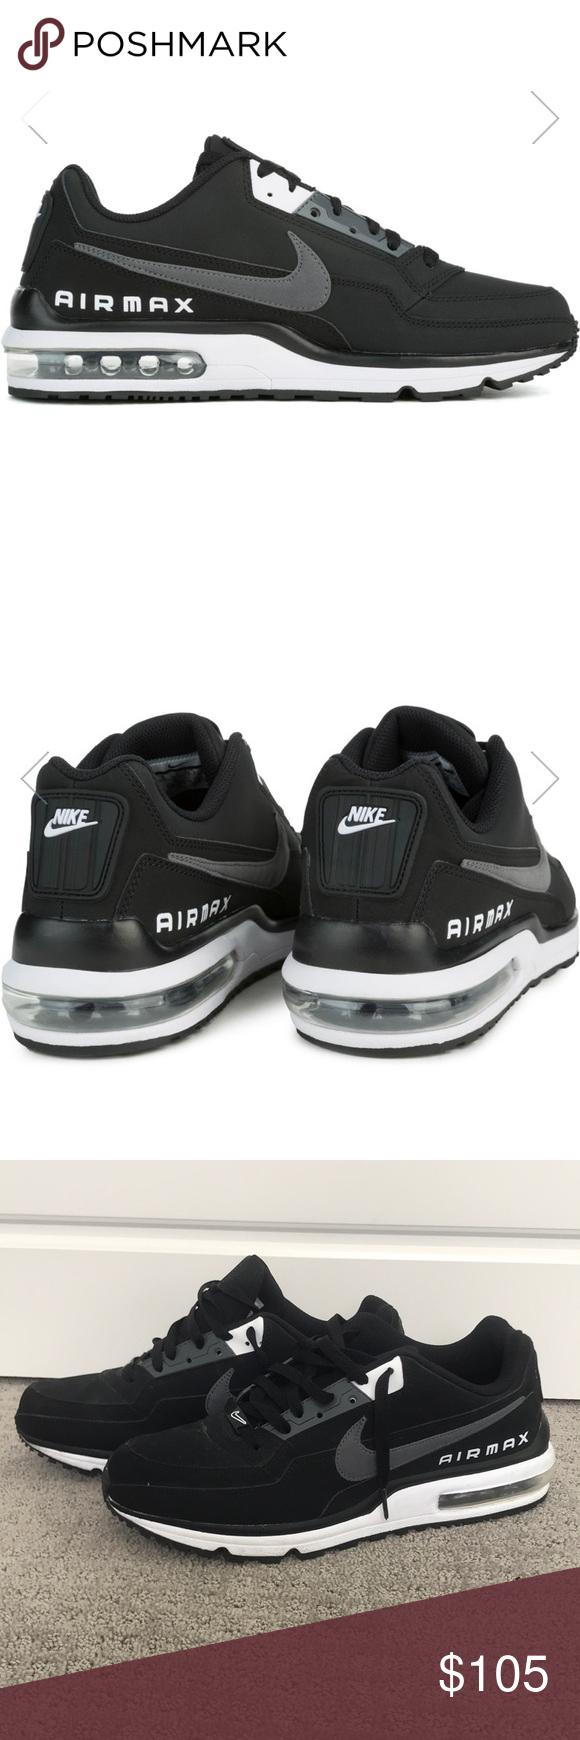 Nike Air Max LTD 3 These black white dark grey Nike Air